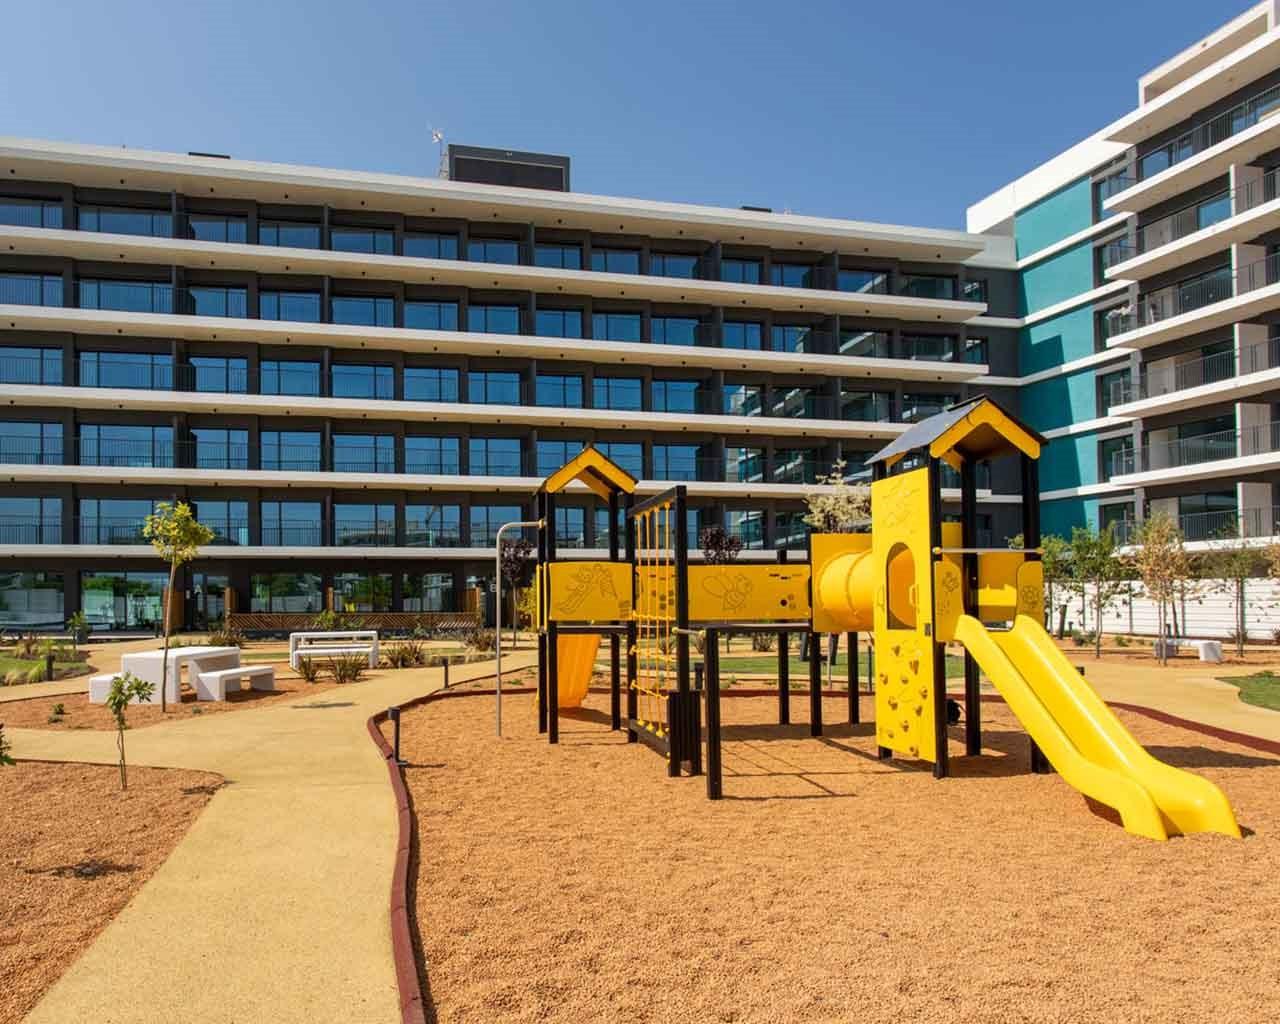 LGF_Fachada-playground